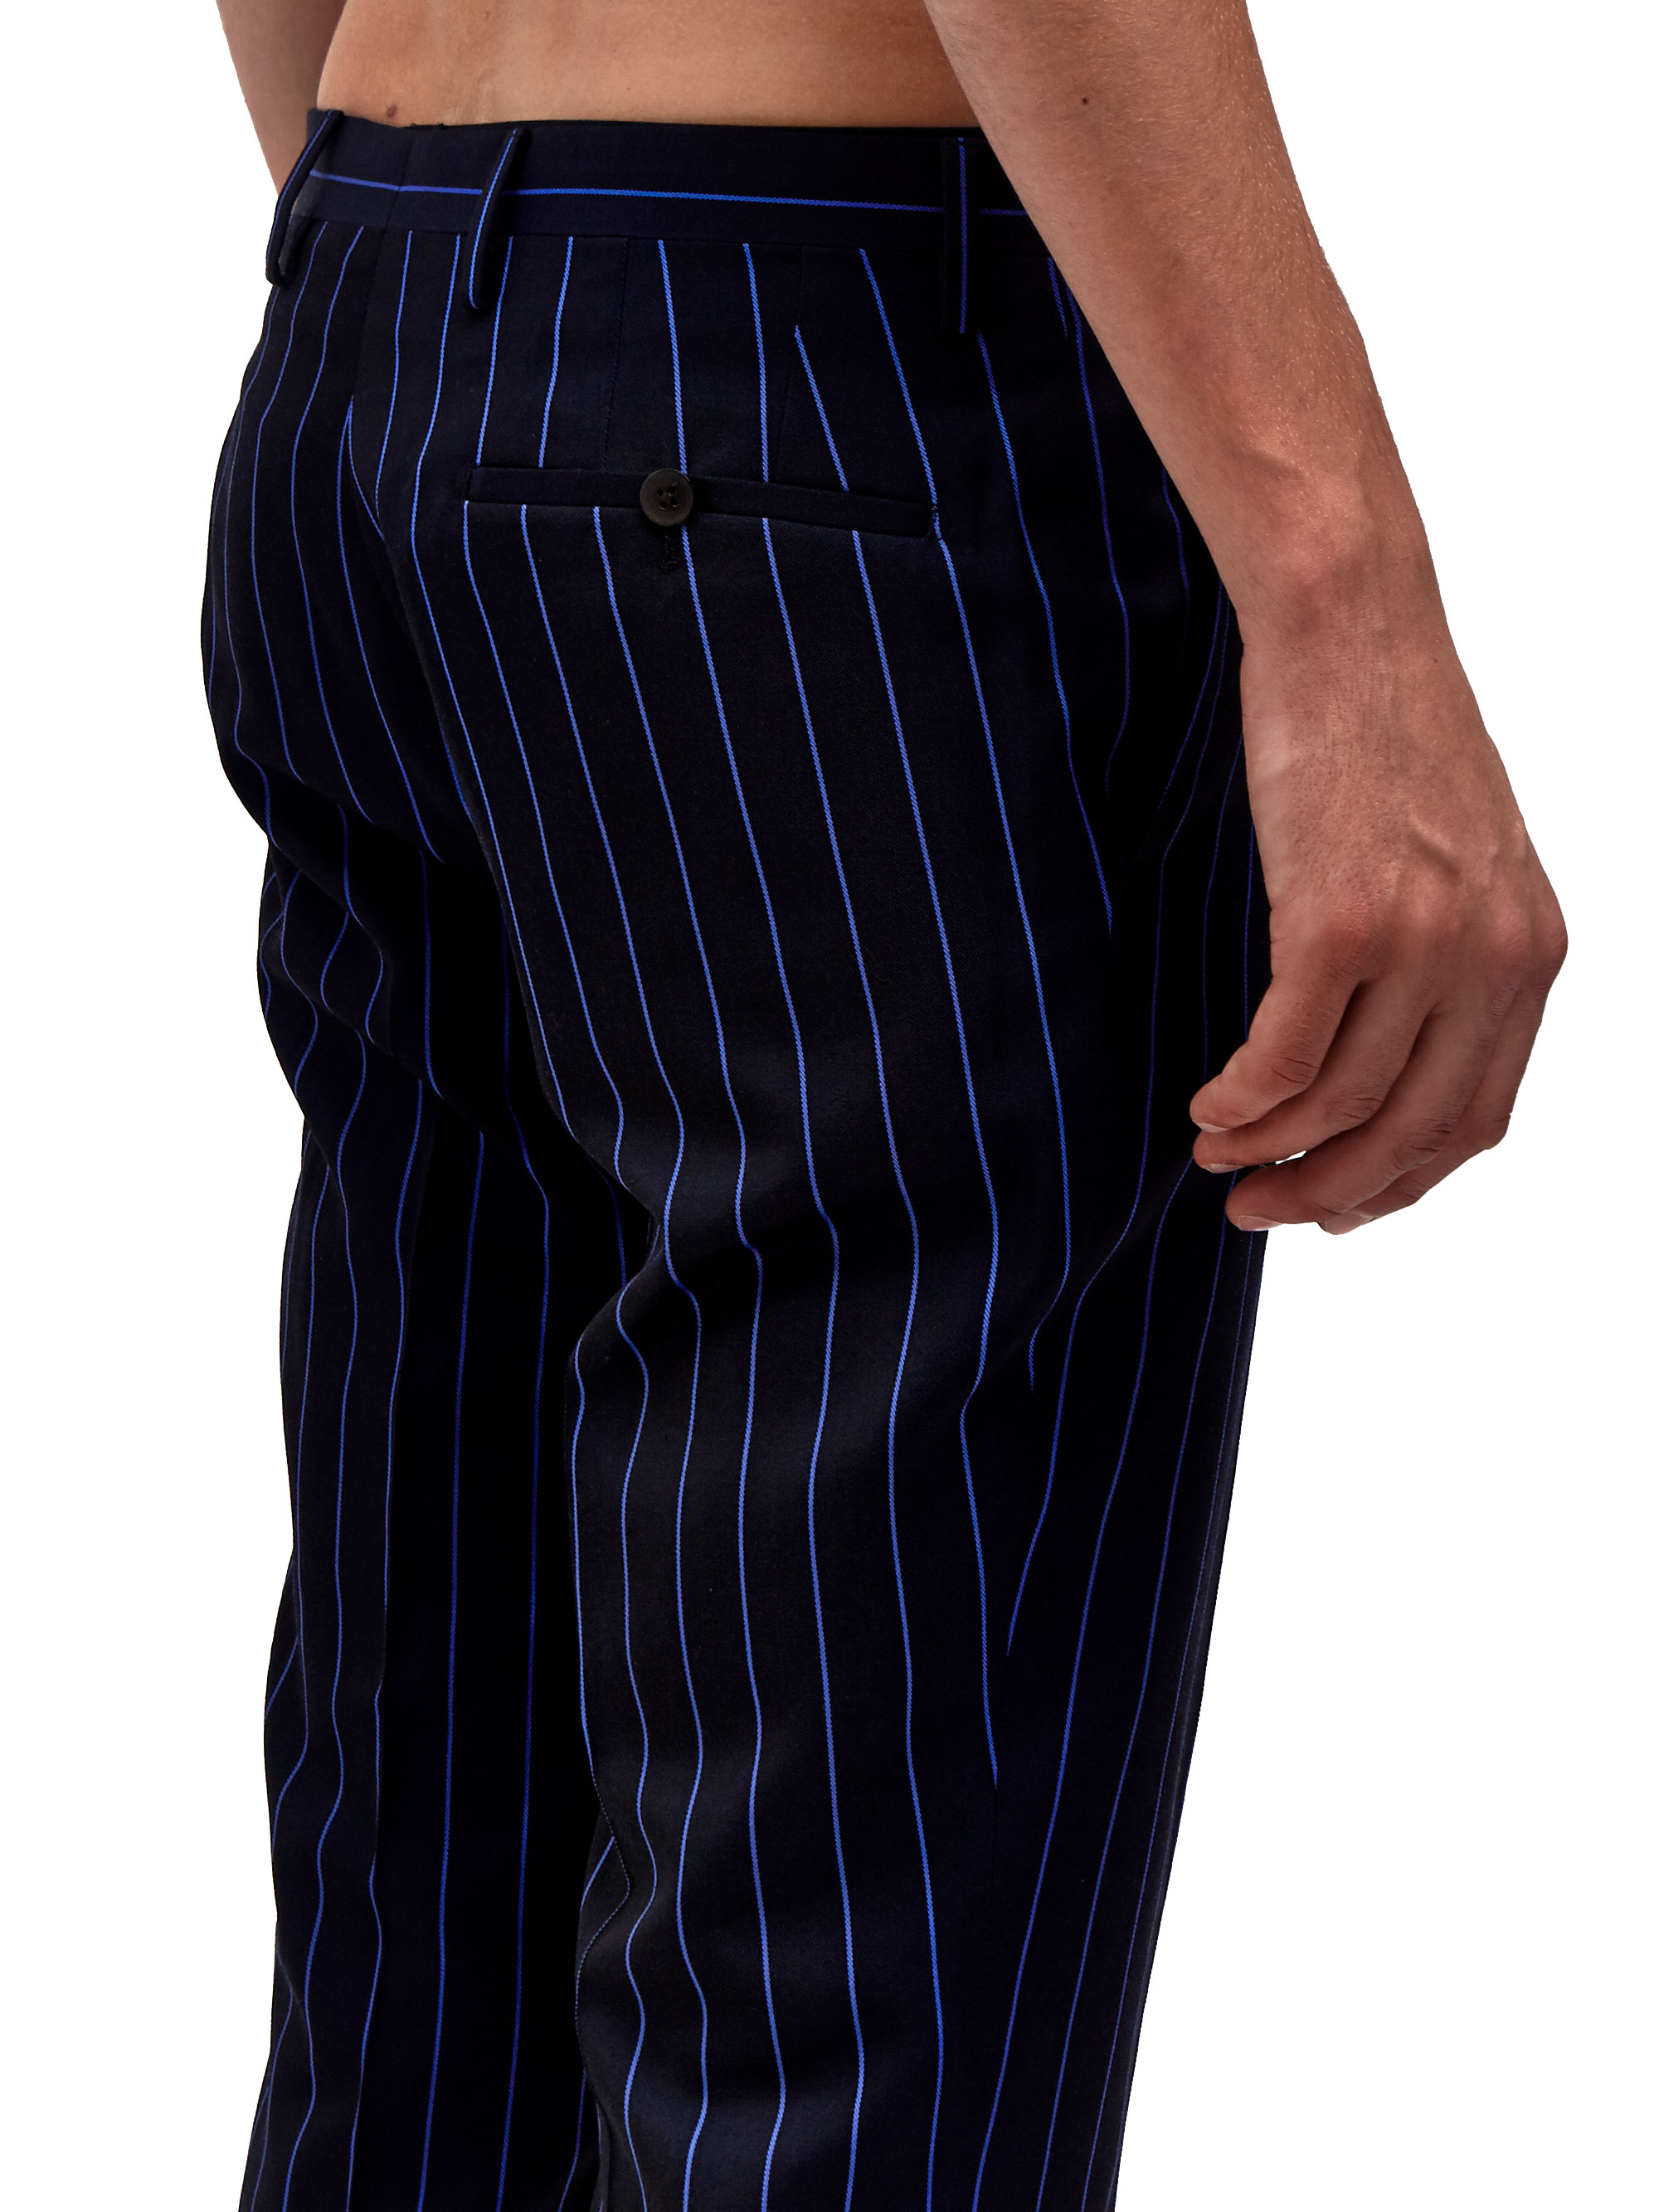 Mens Striped Pants | Pant So